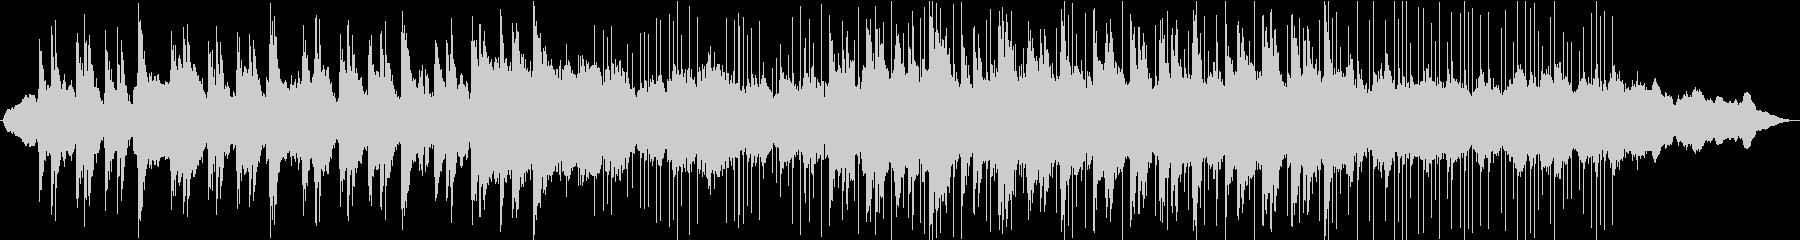 KANTアラビアの夜的なBGM0807の未再生の波形